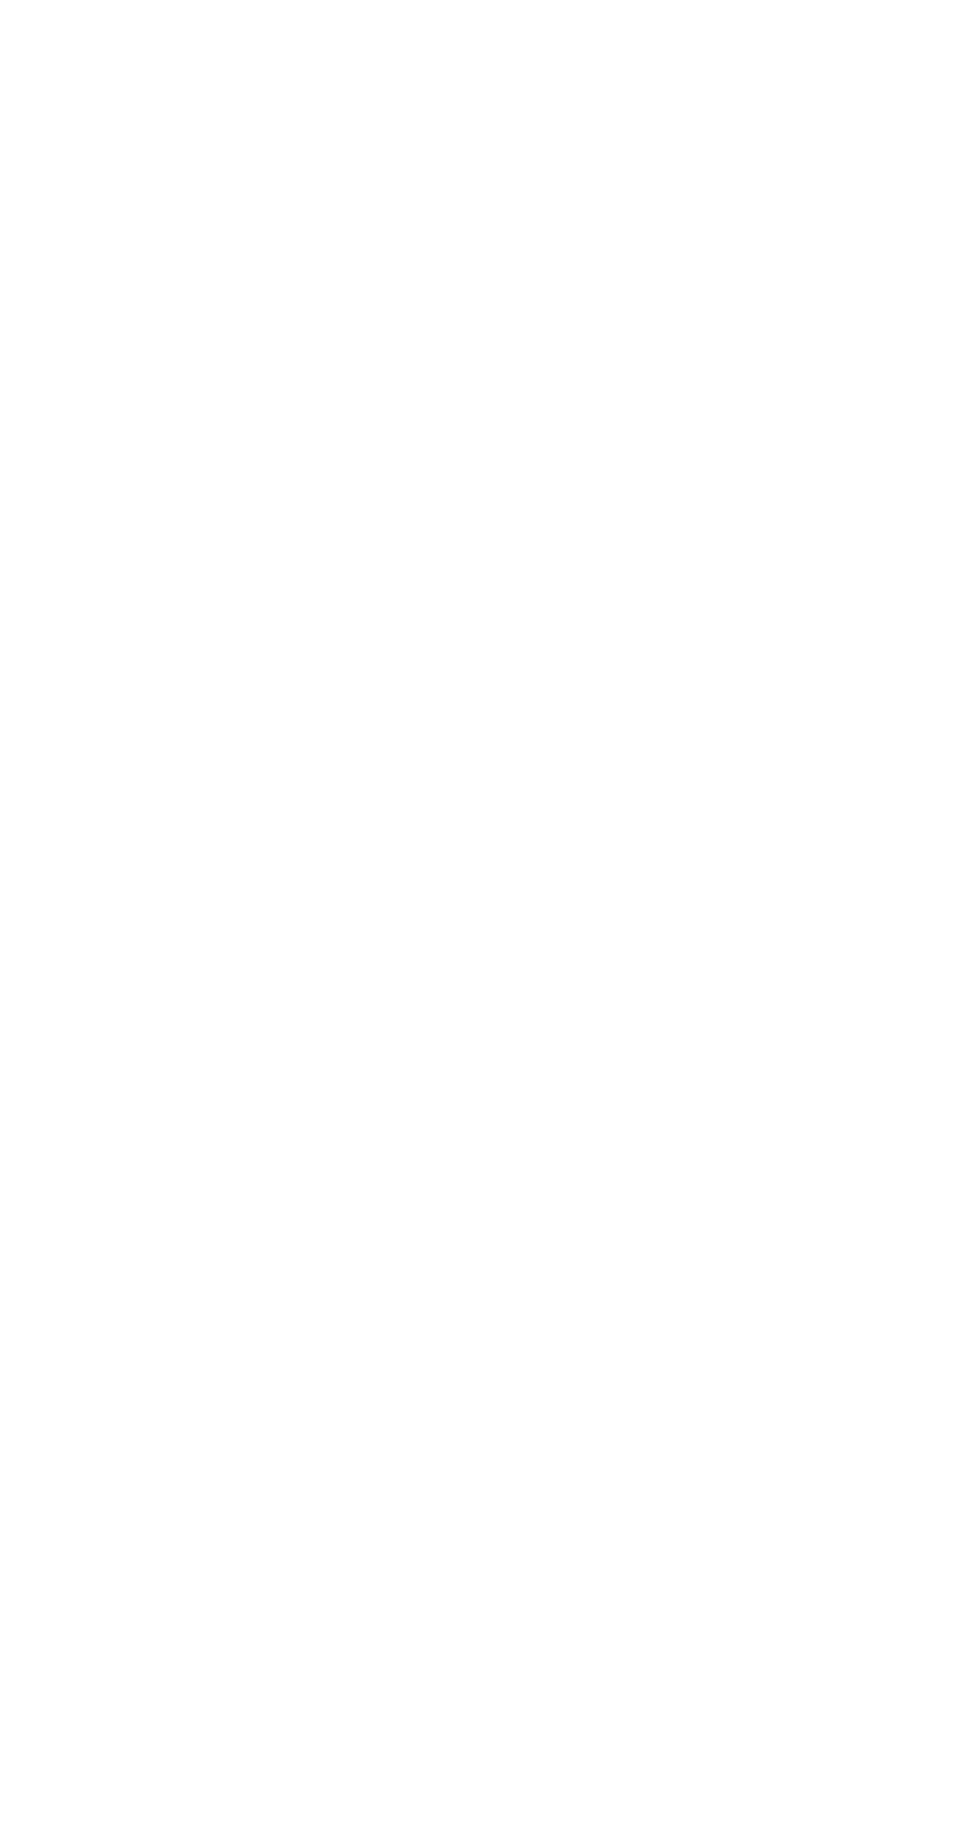 VILLA FONTE POLANICA ZDRÓJ M.0.4